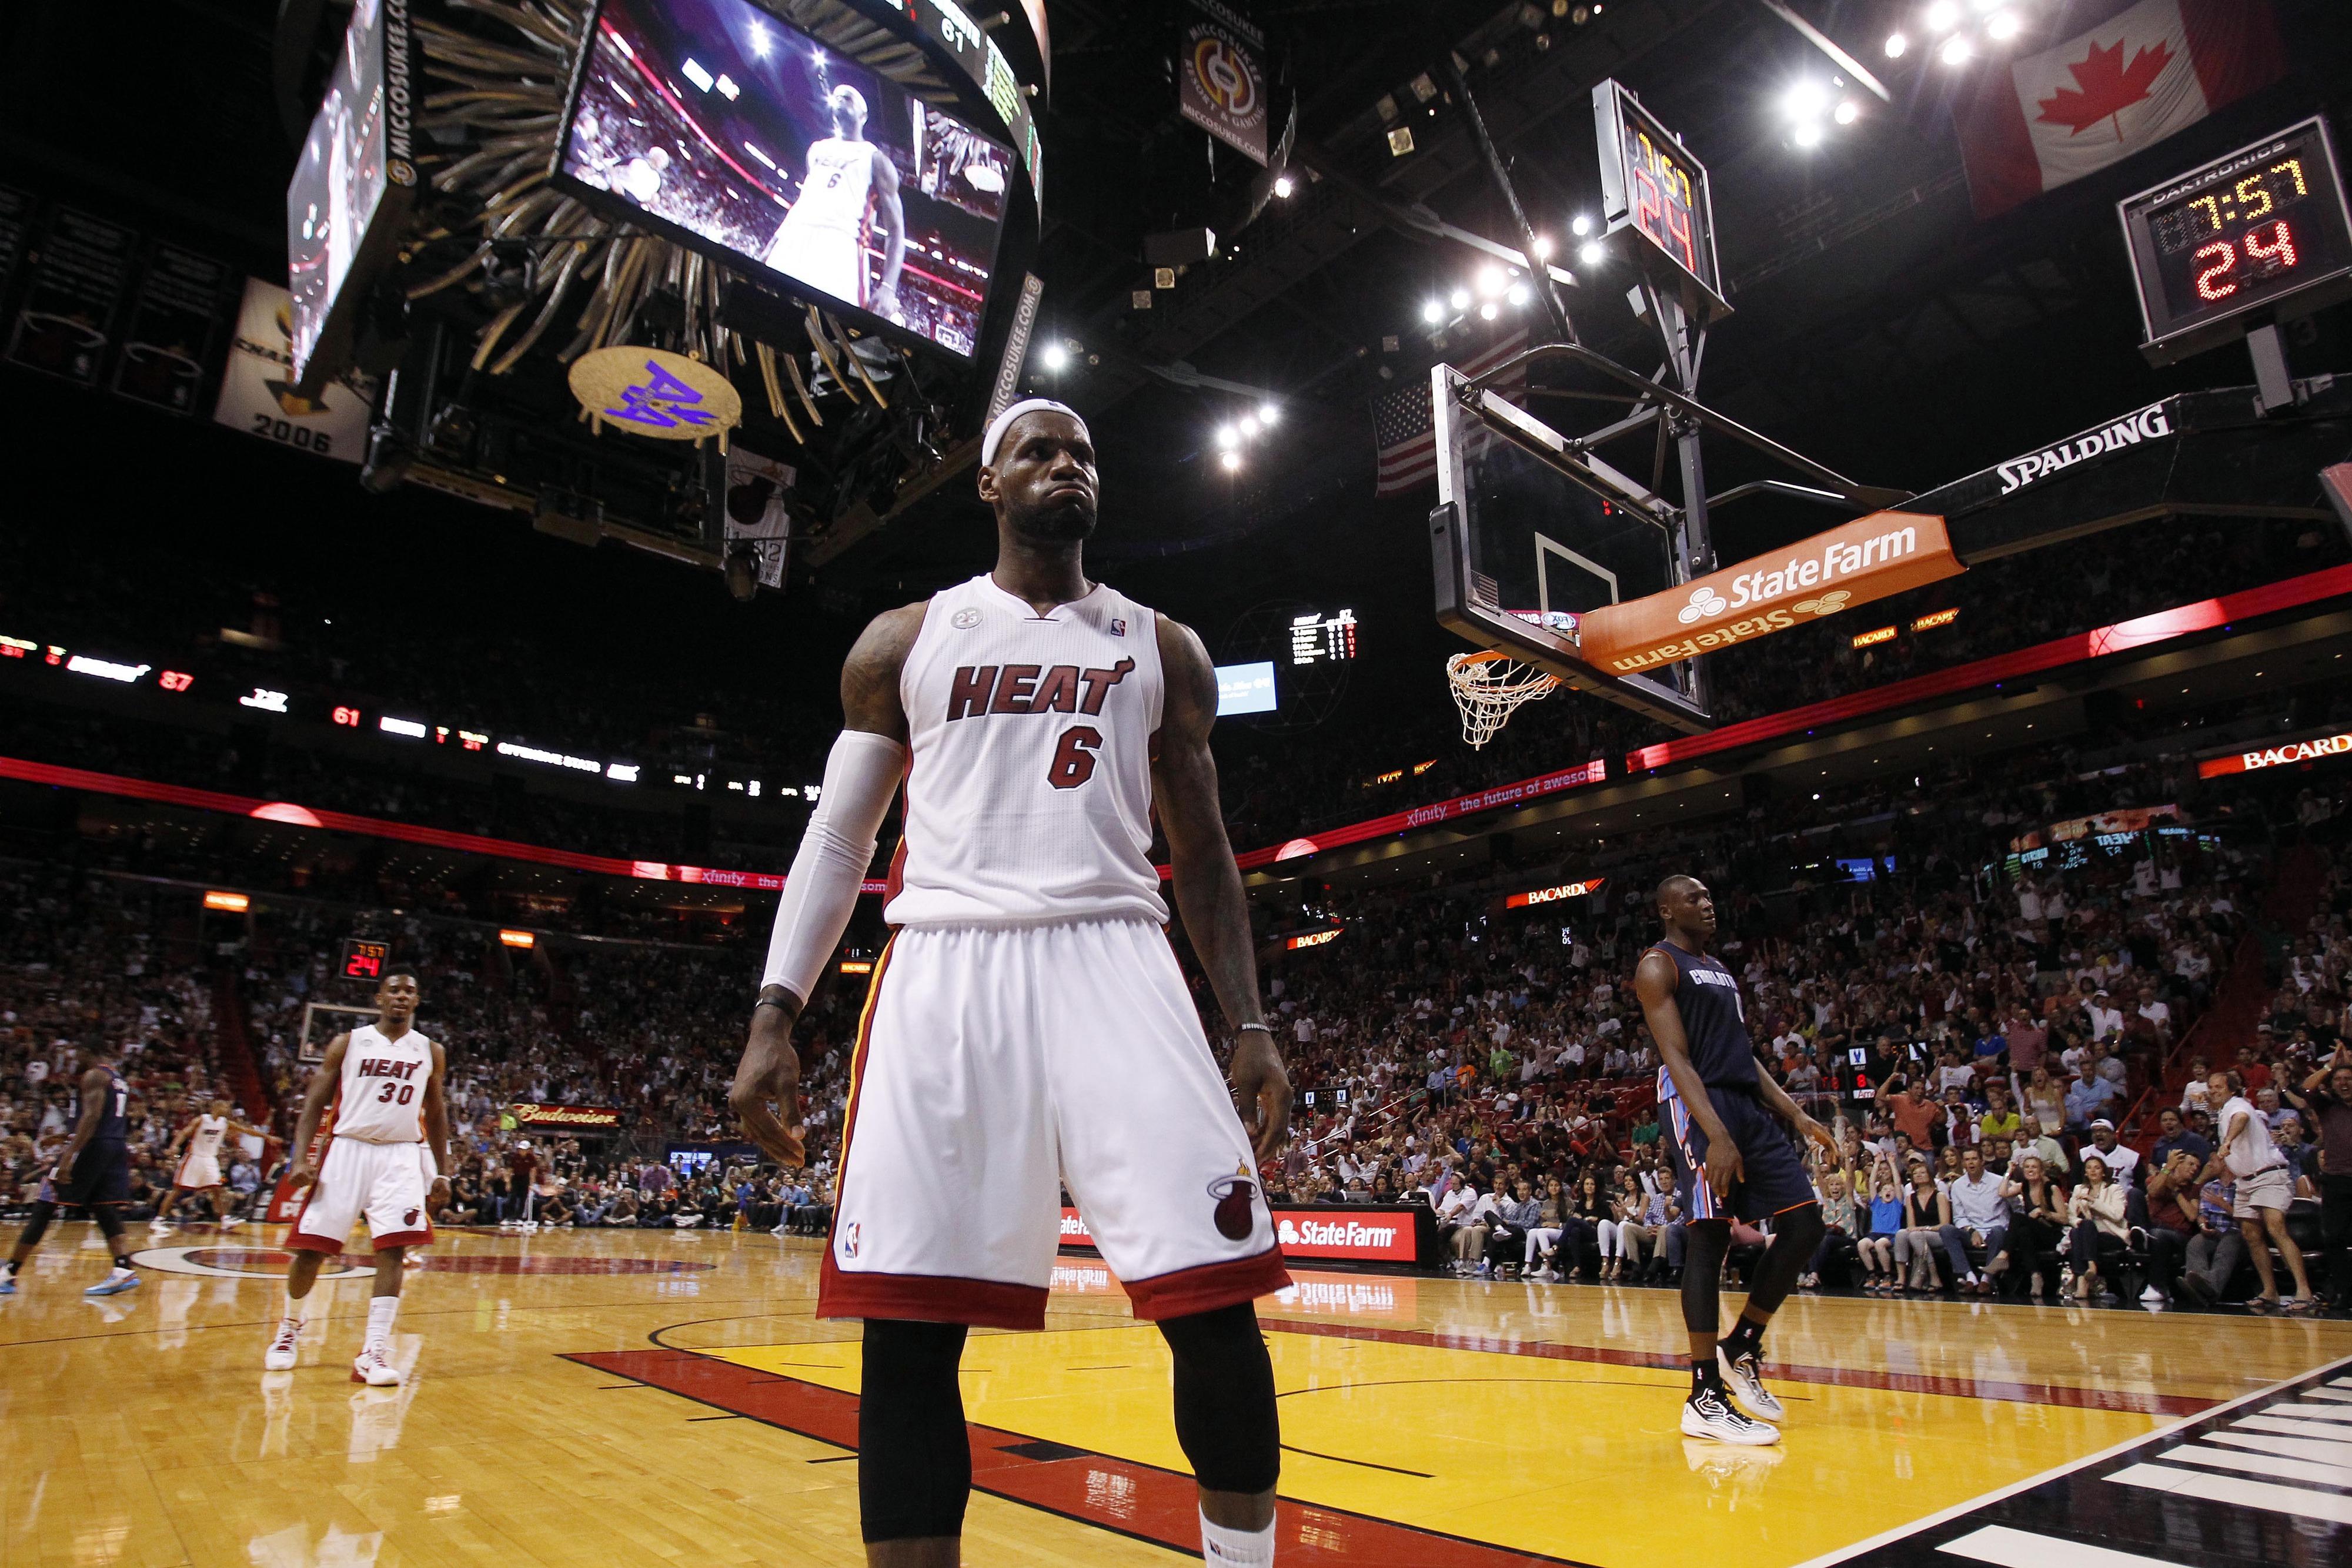 NBA scores: Heat win 26th straight, Rockets tip Spurs